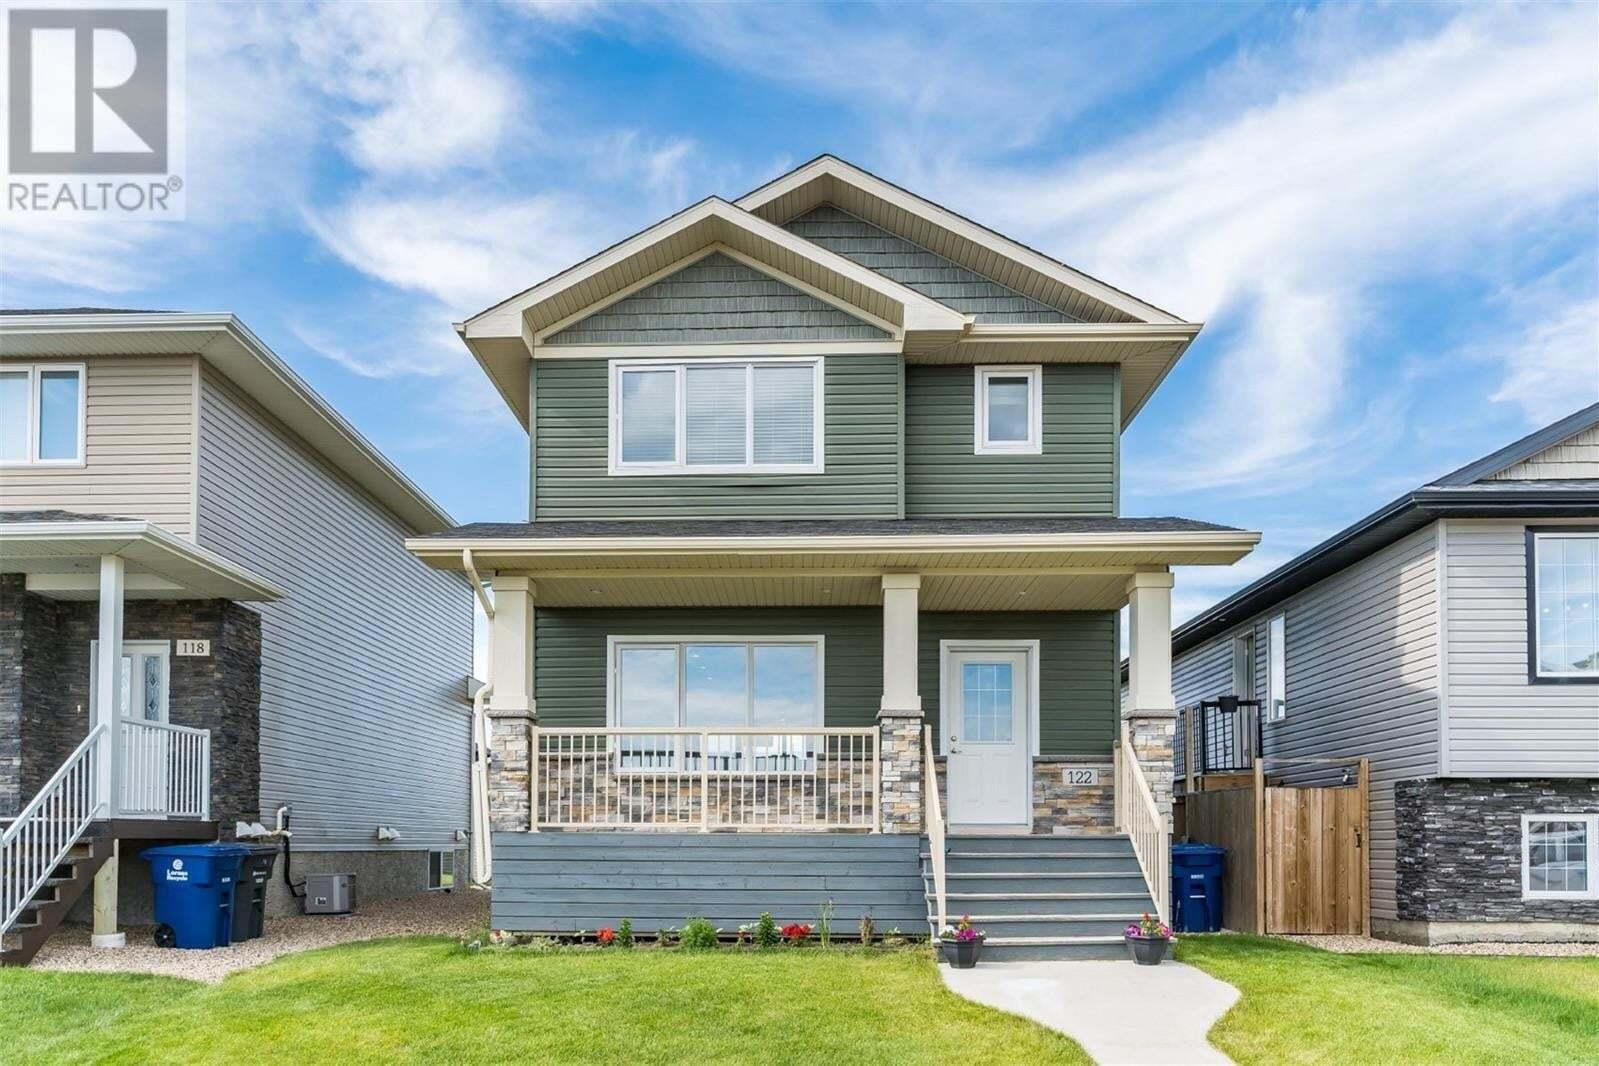 House for sale at 122 Wyant Ln Saskatoon Saskatchewan - MLS: SK814311